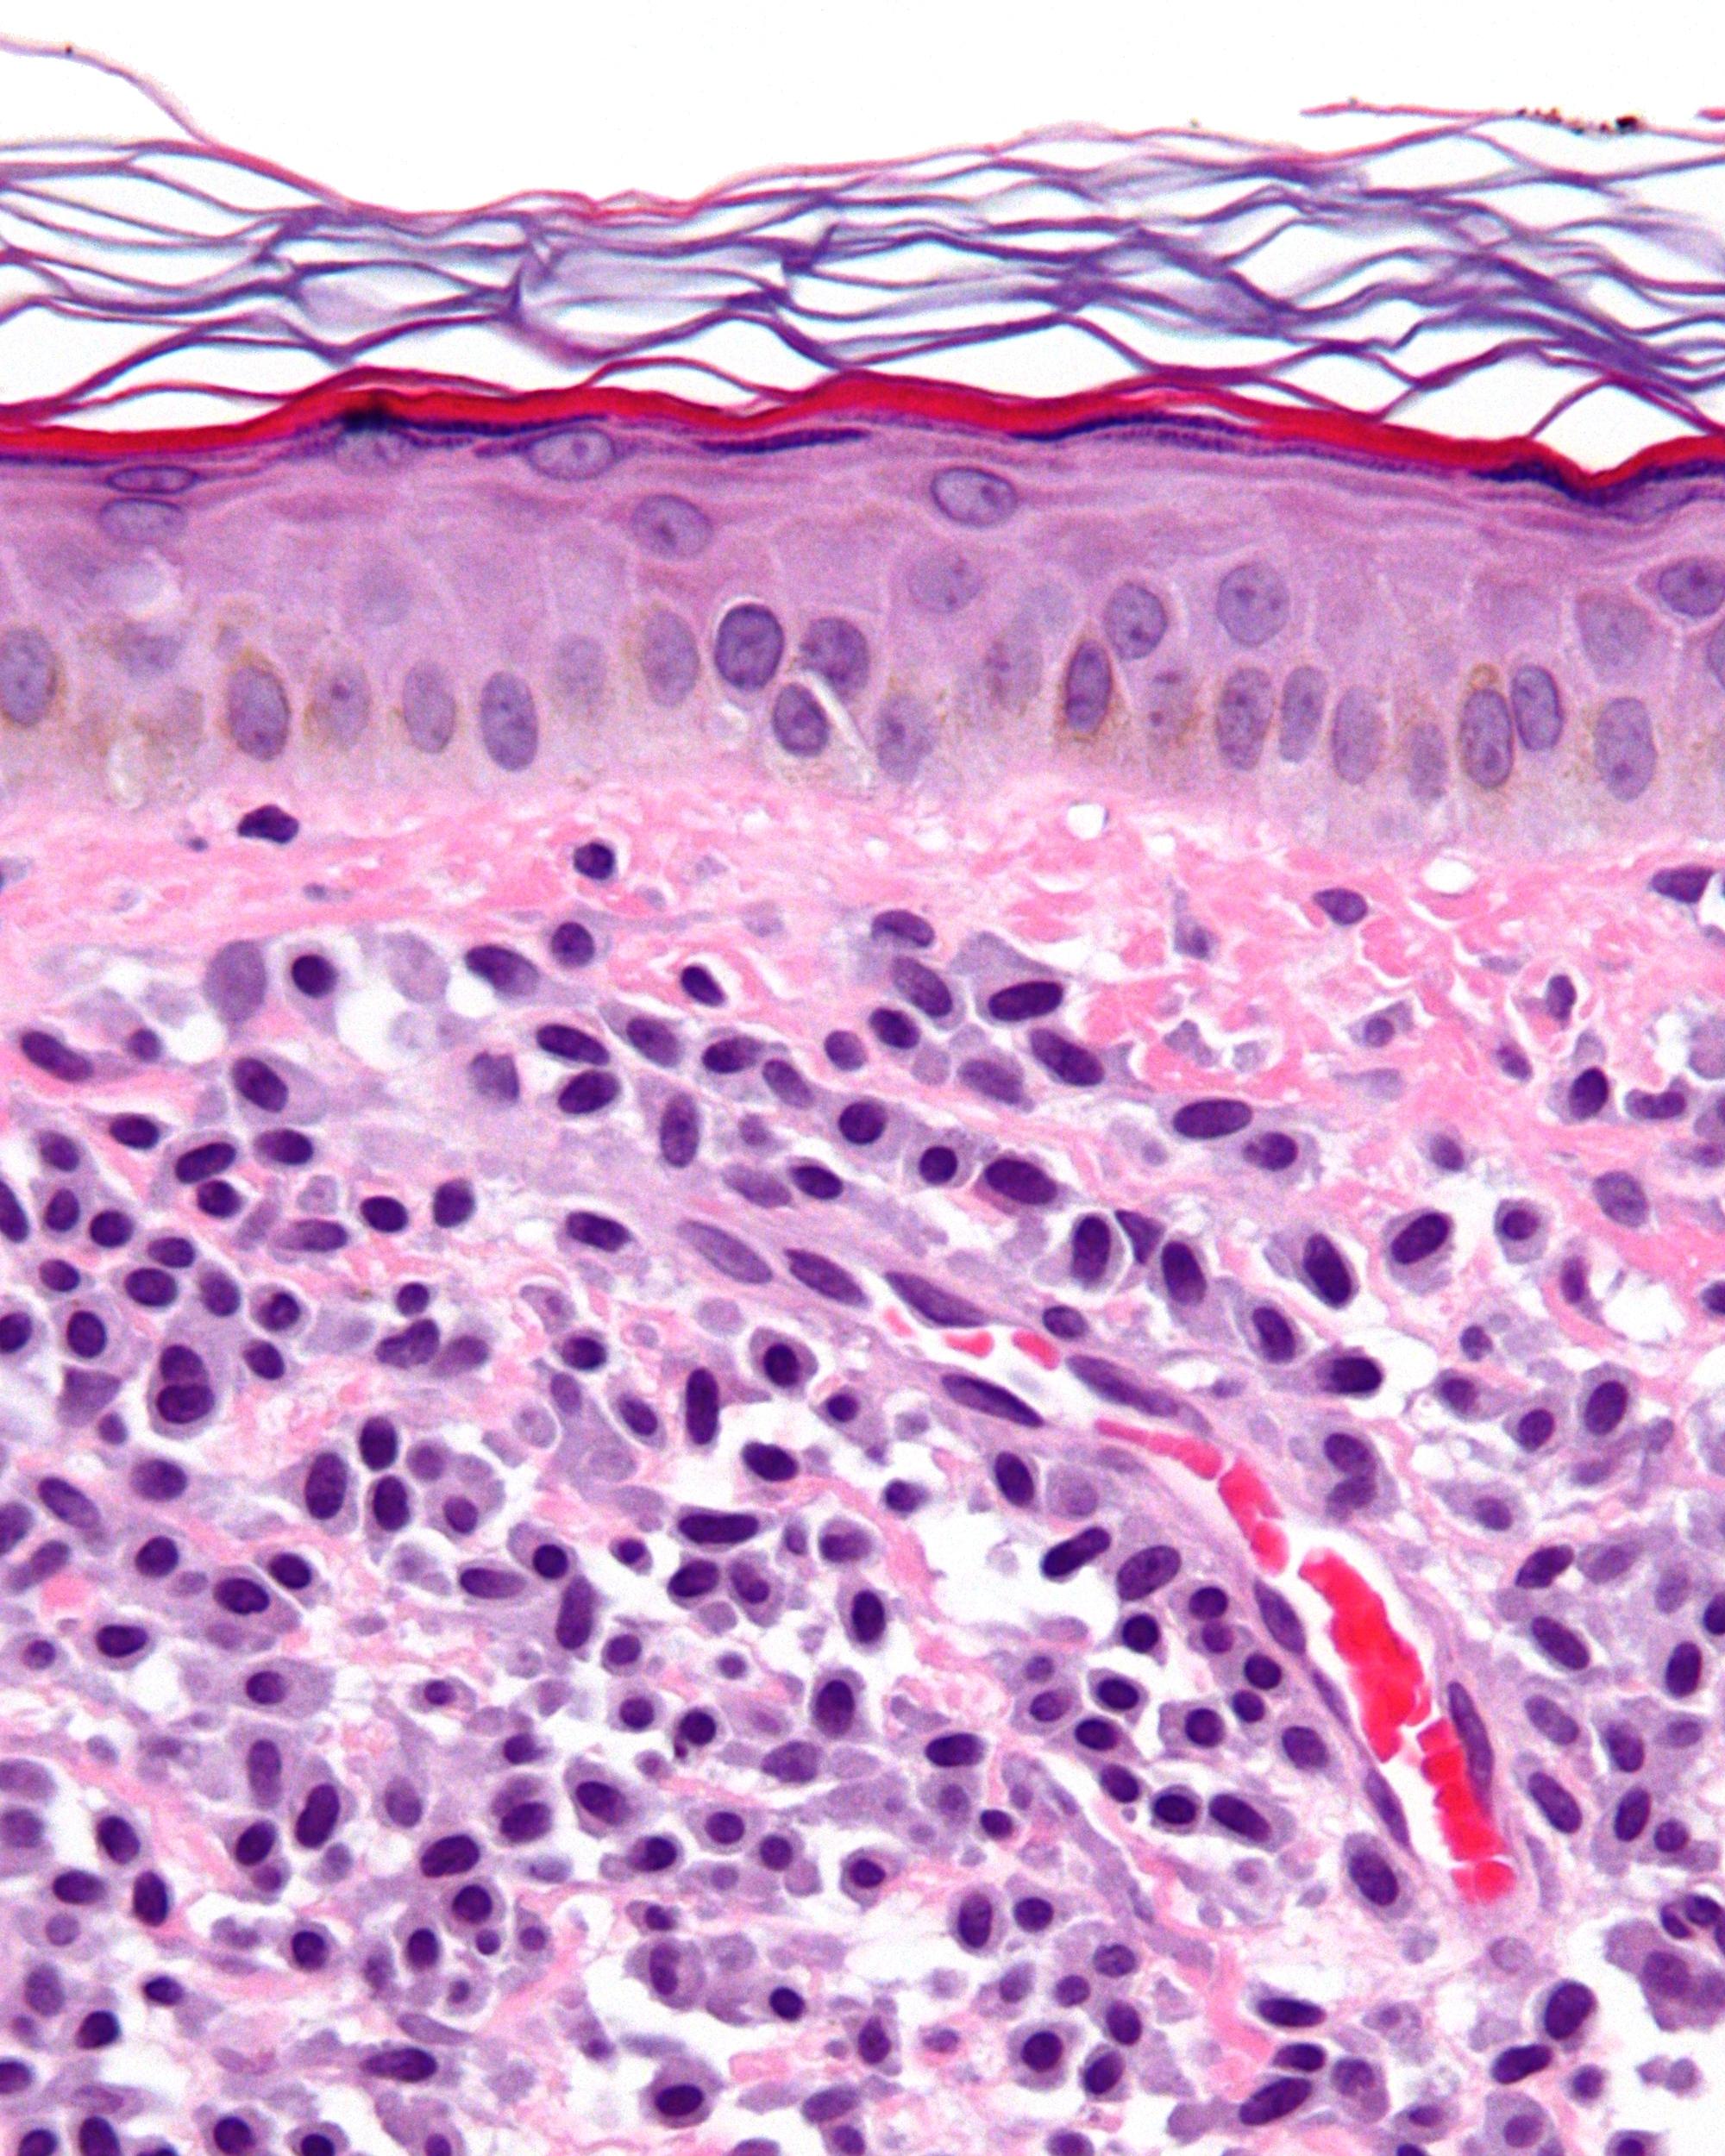 Mastocytosis - Wikipedia